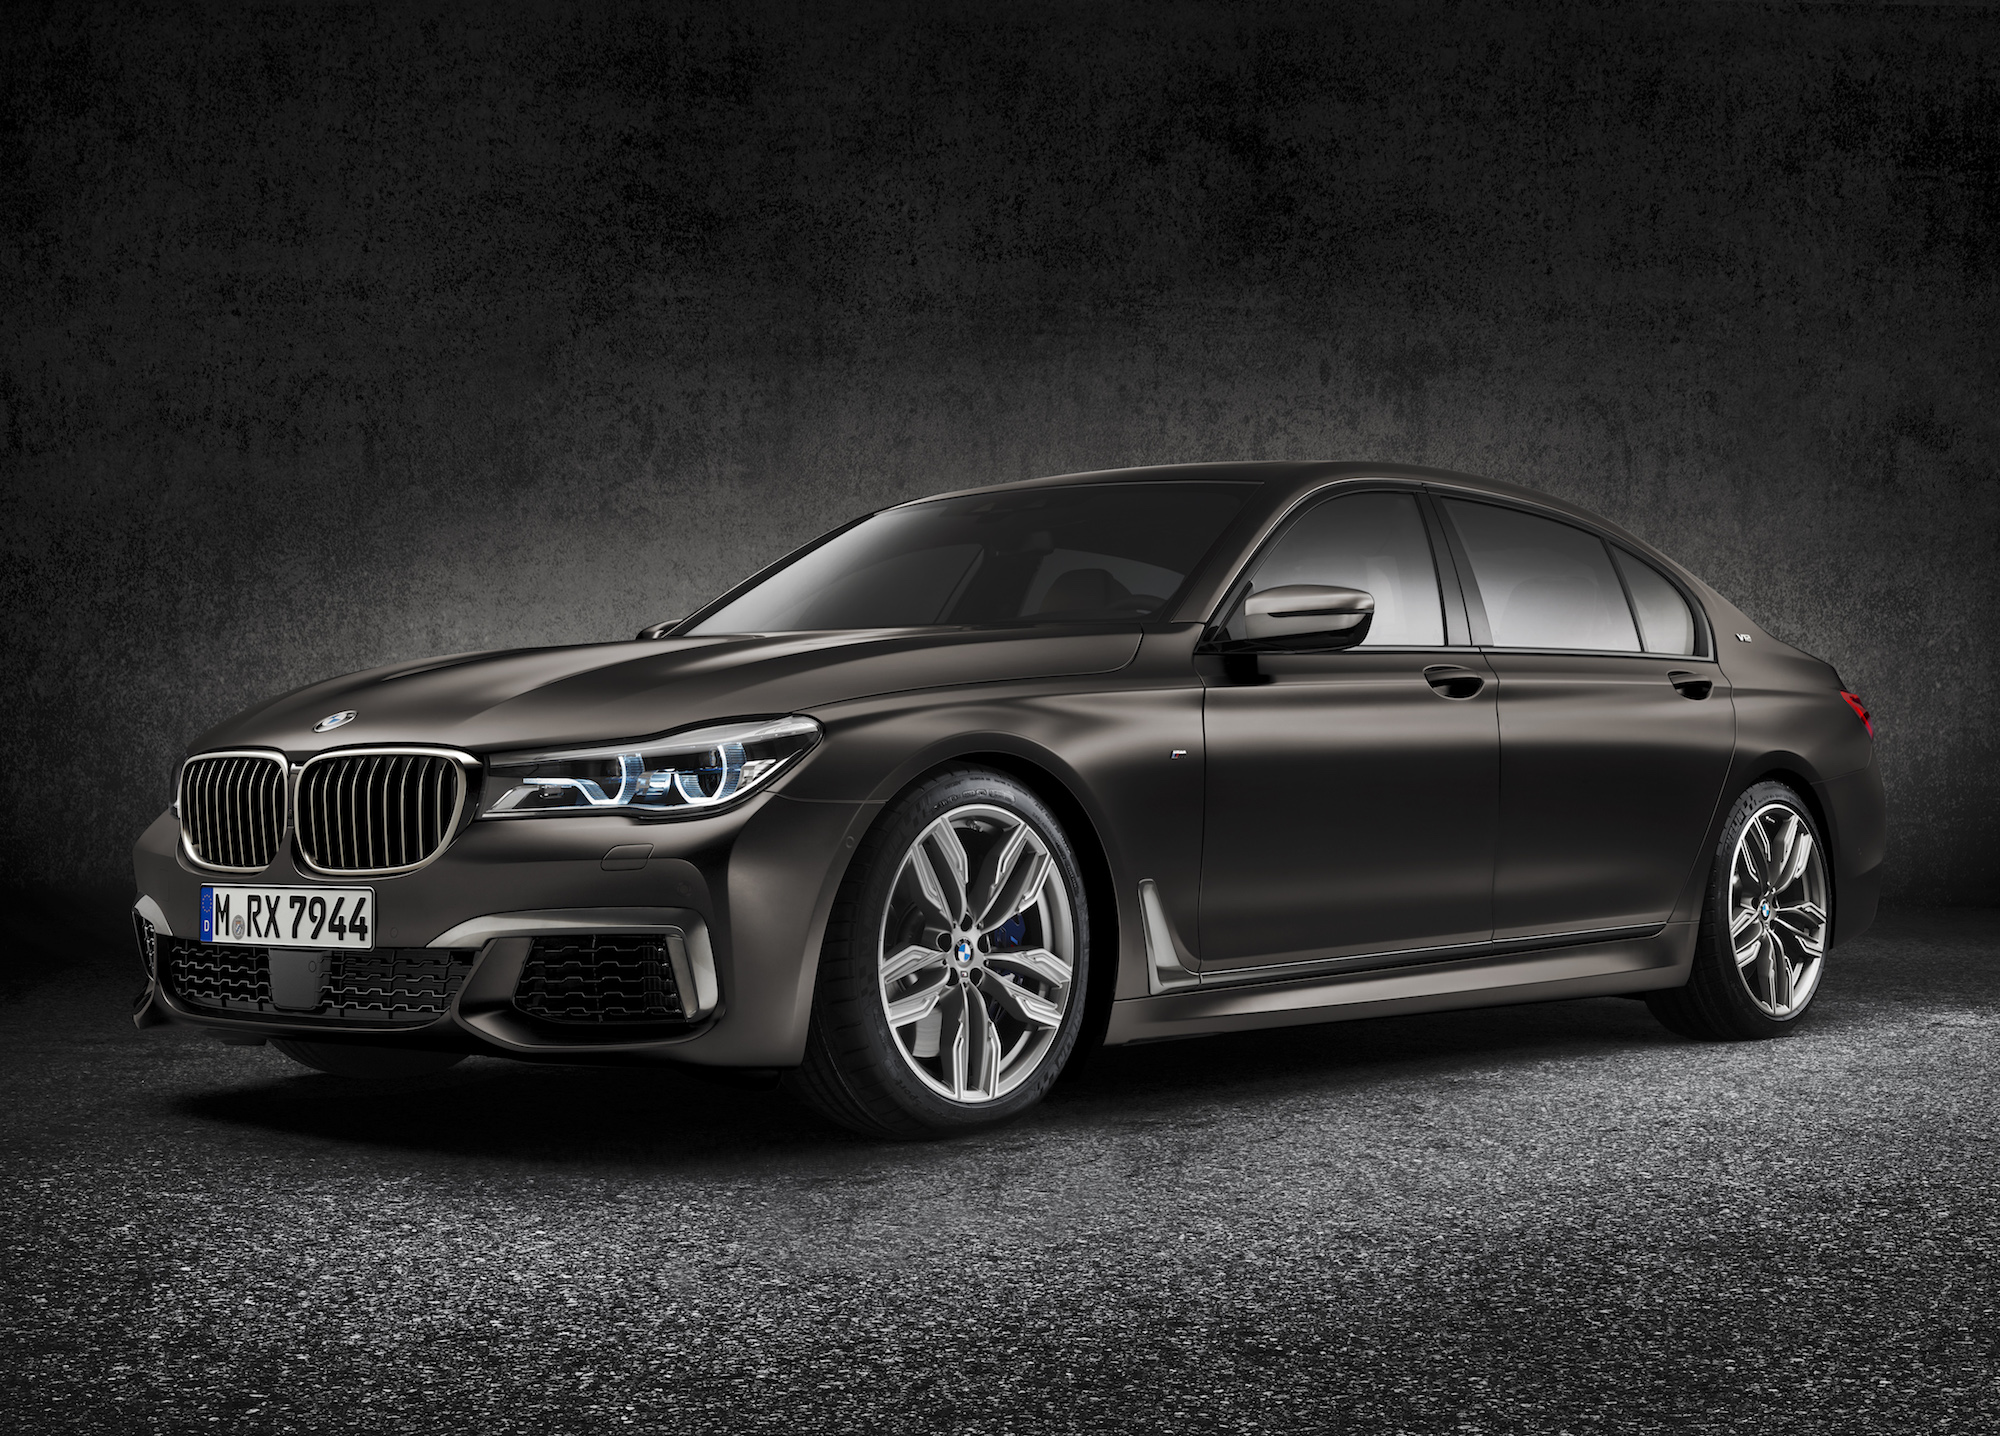 Bmw 7 Series Gets V 12 Powered M Performance Model